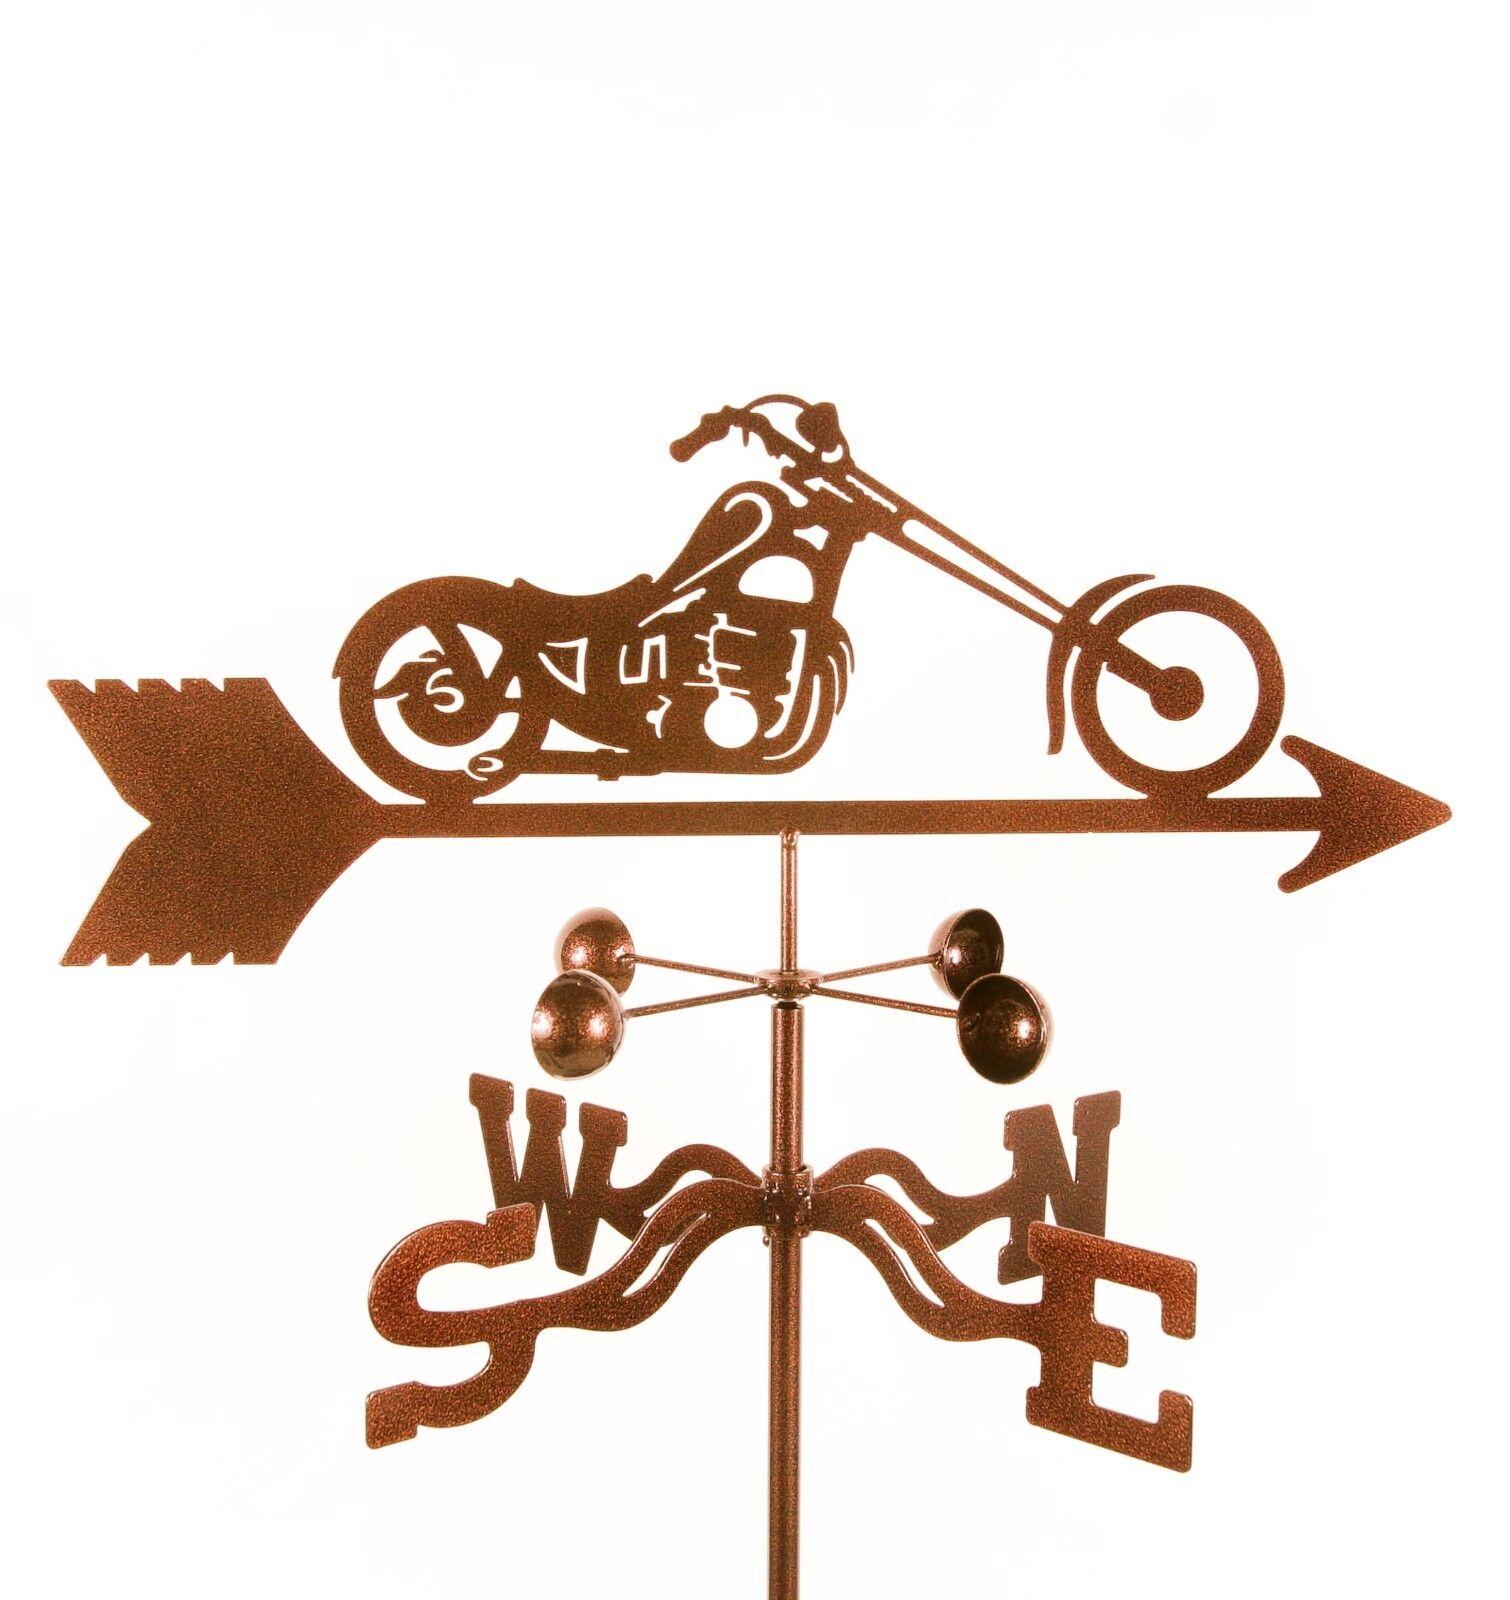 Chopper Motorcycle Weathervane, Harley? Cycle, Bike Vane w/ Choice of Mount